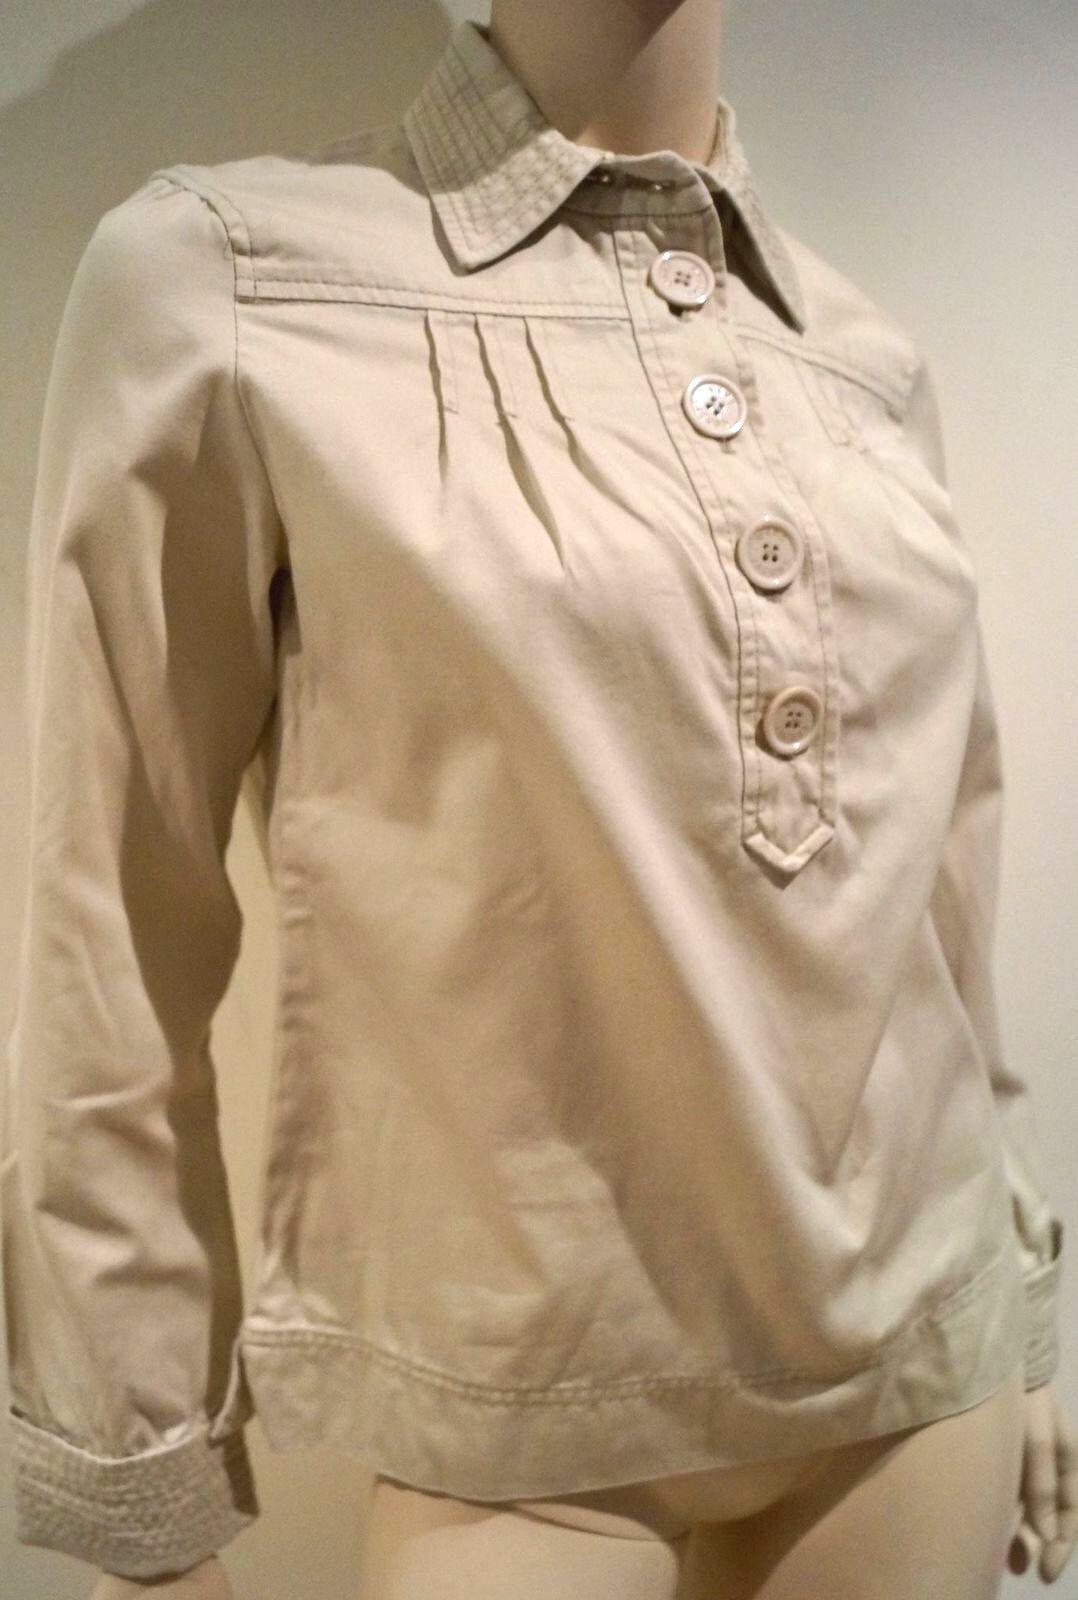 MARC JACOBS damen Beige 100% Cotton Collarot Long Sleeve Blouse Top US8 UK12